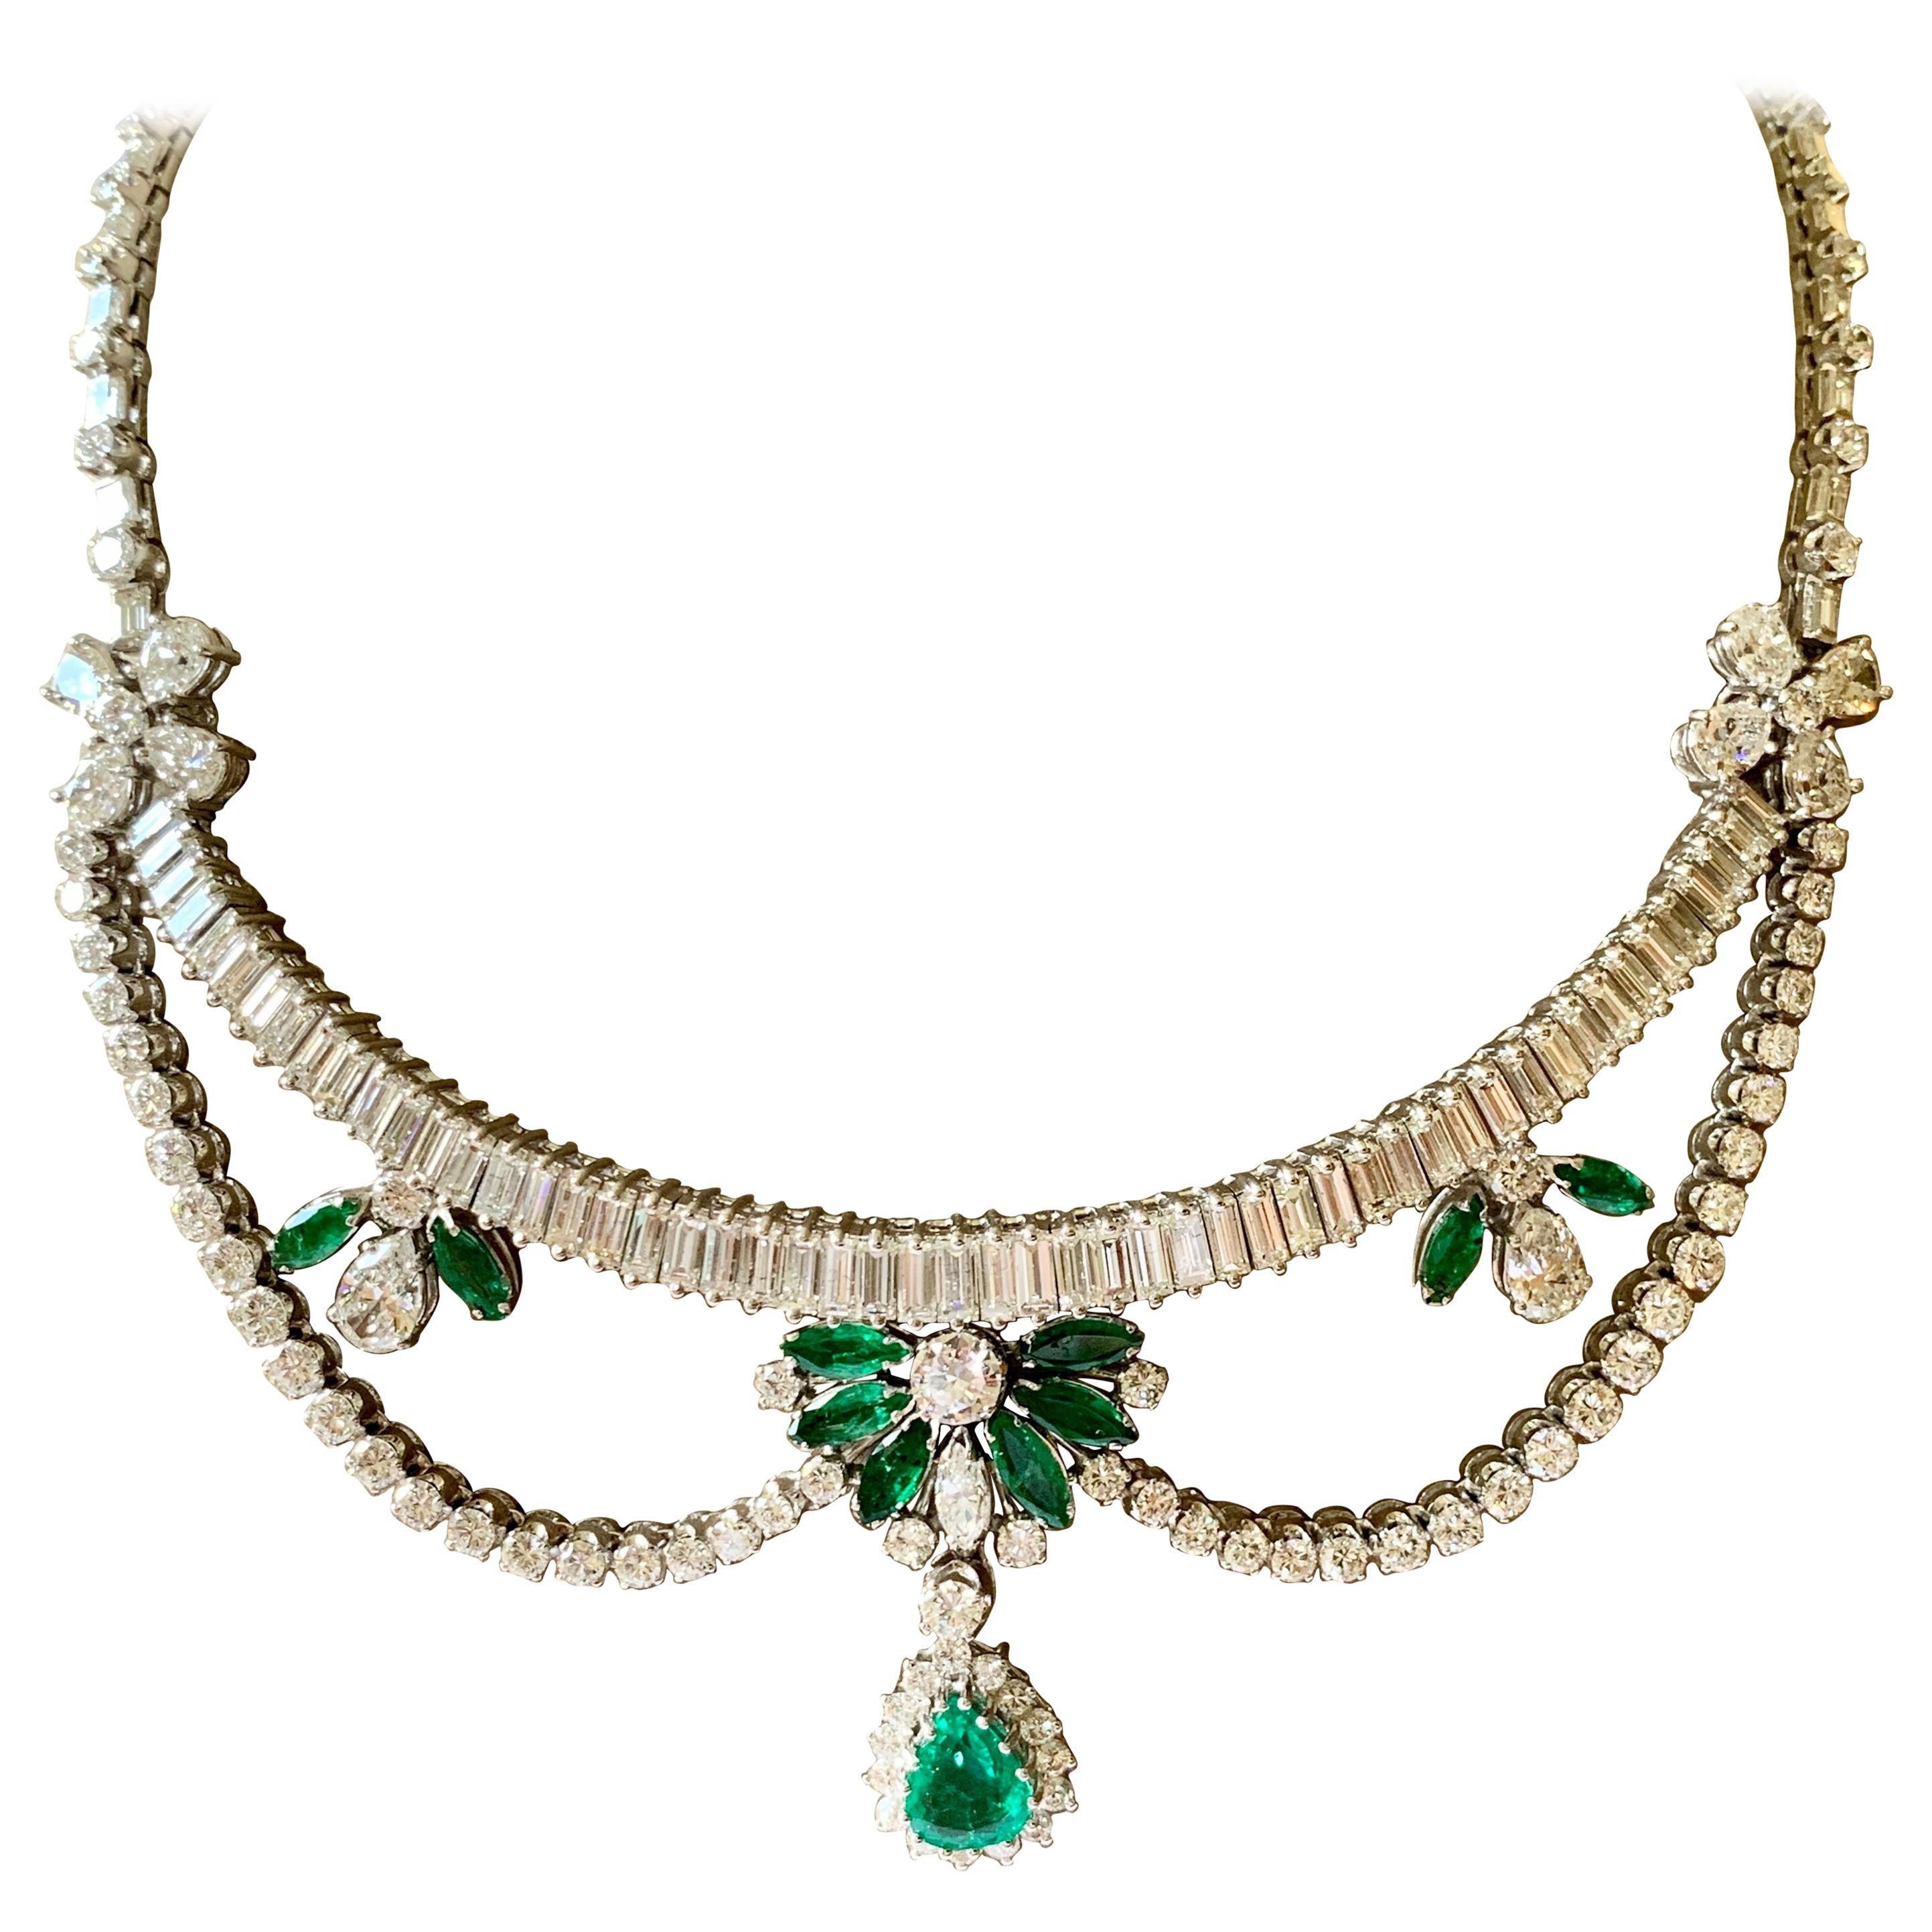 Stunning Vintage Platinum Emerald and Diamond Necklace